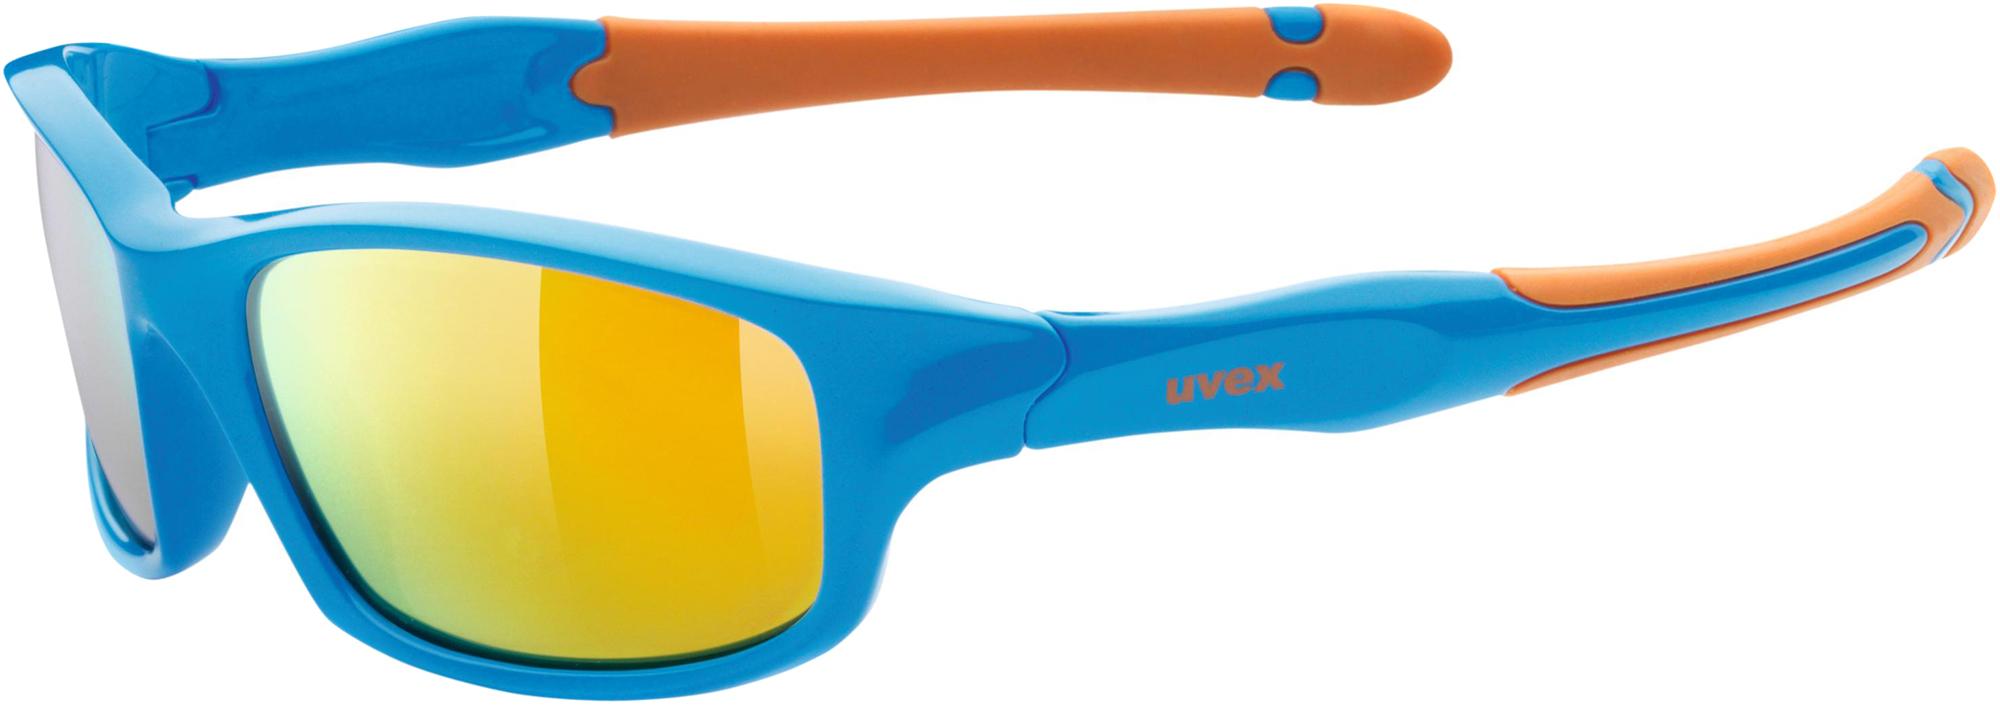 Uvex Солнцезащитные очки детские Uvex Sportstyle 507